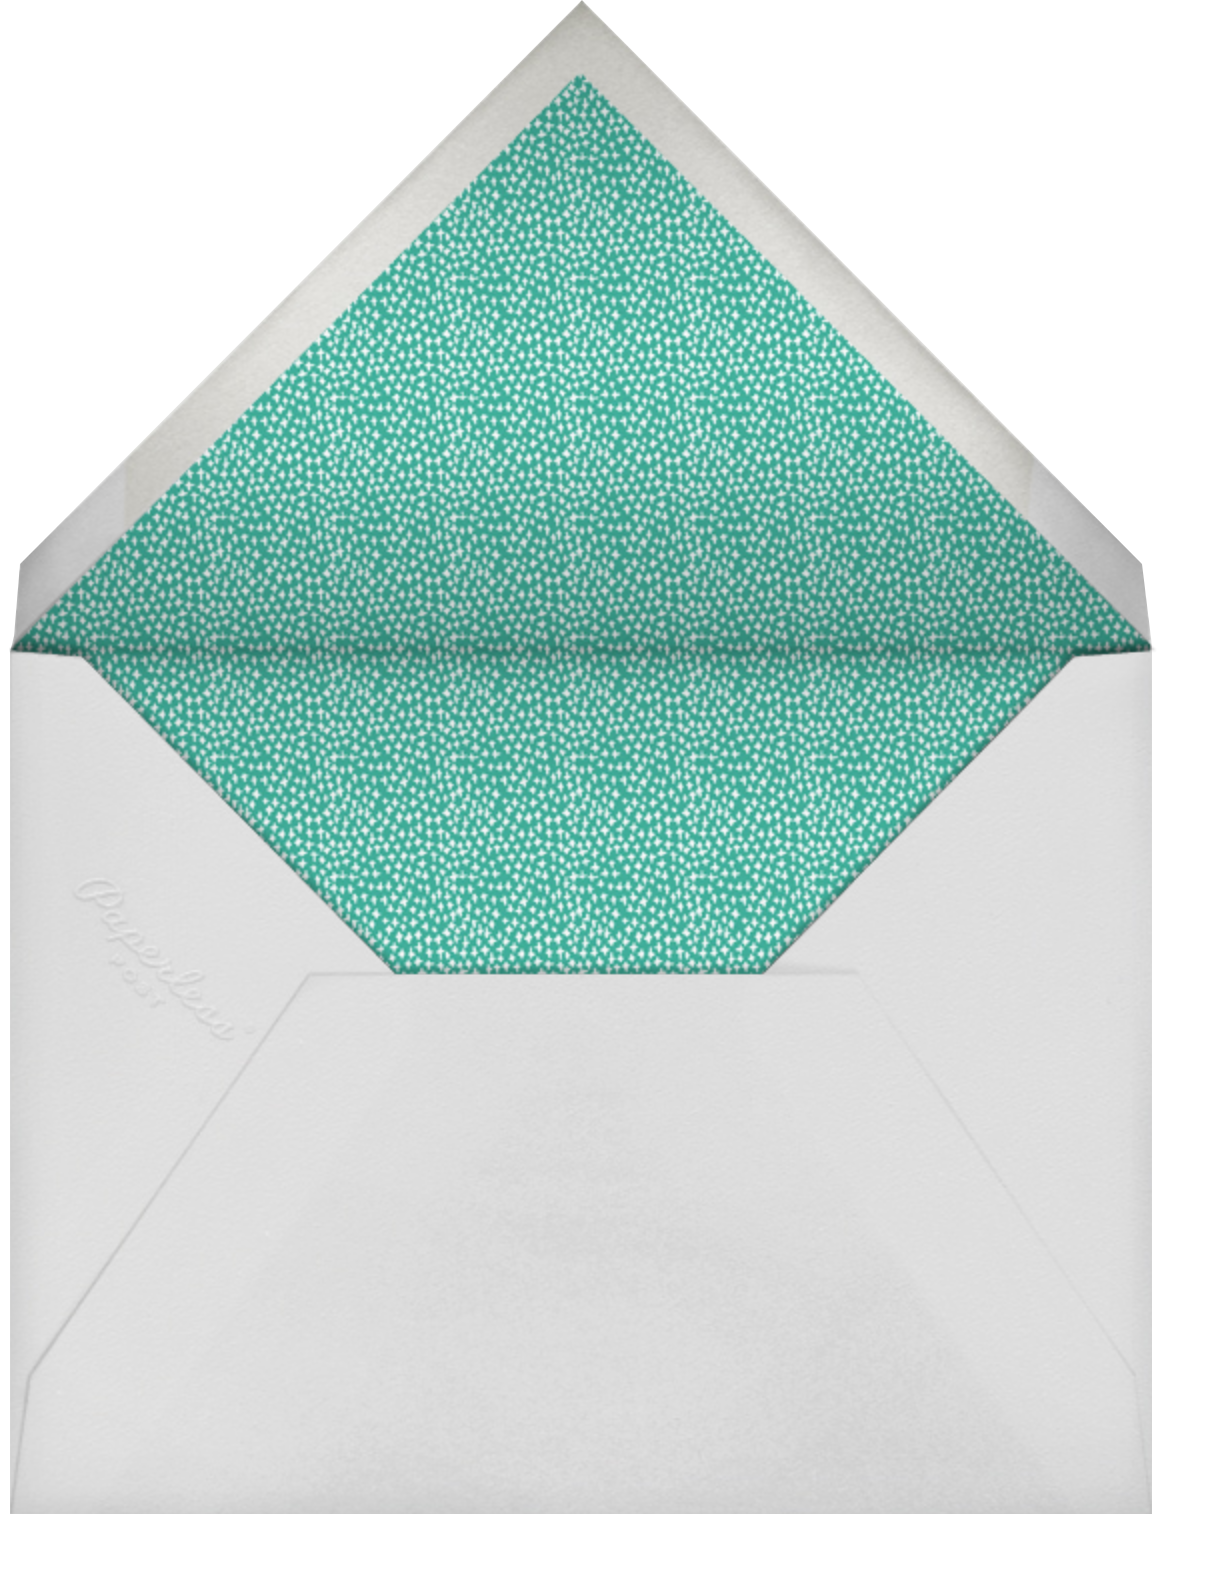 Pine and Dandy - White - Mr. Boddington's Studio - Envelope